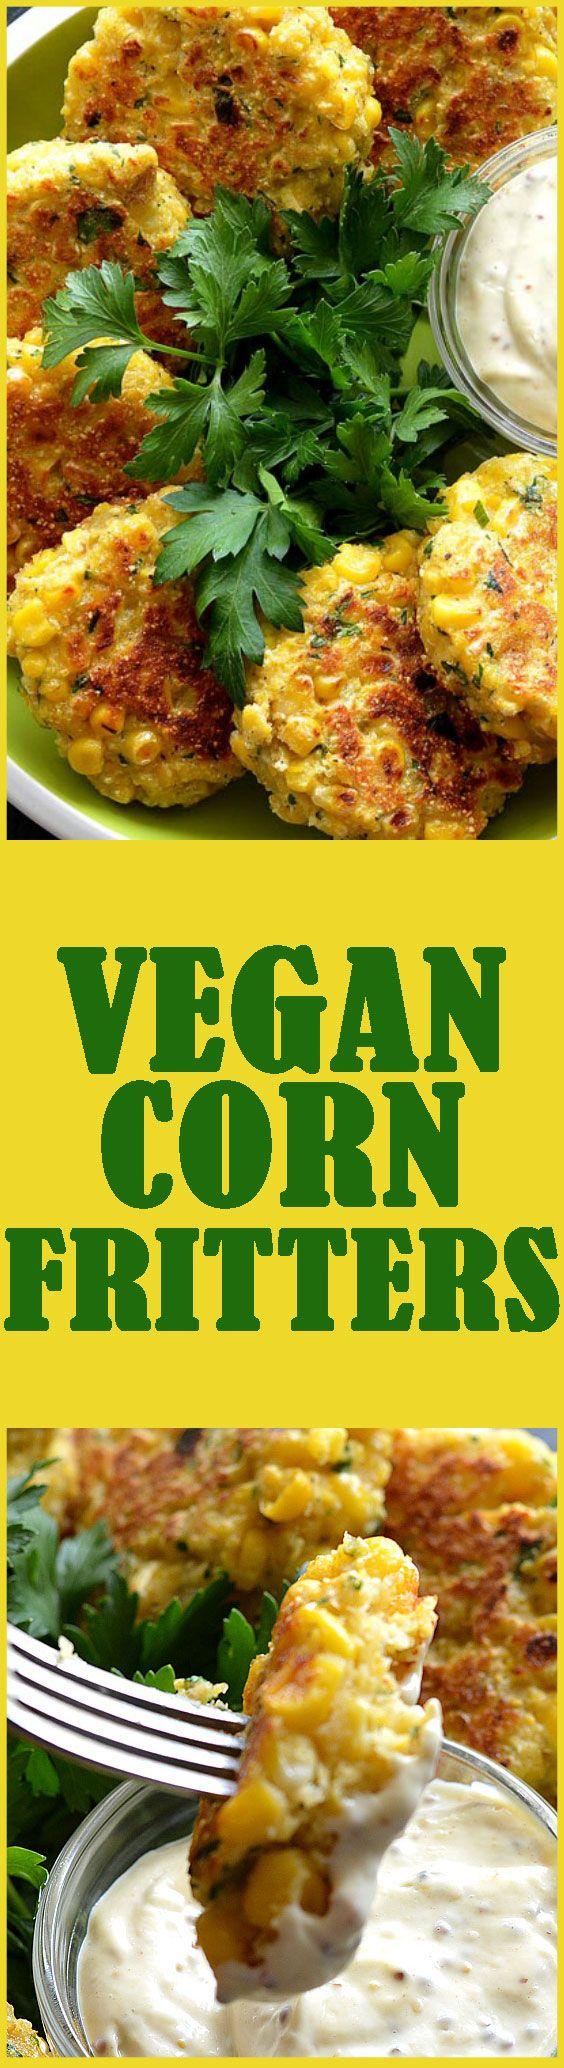 Vegan Corn Fritters | Recipe | Corn Fritters, Fritters and Vegans